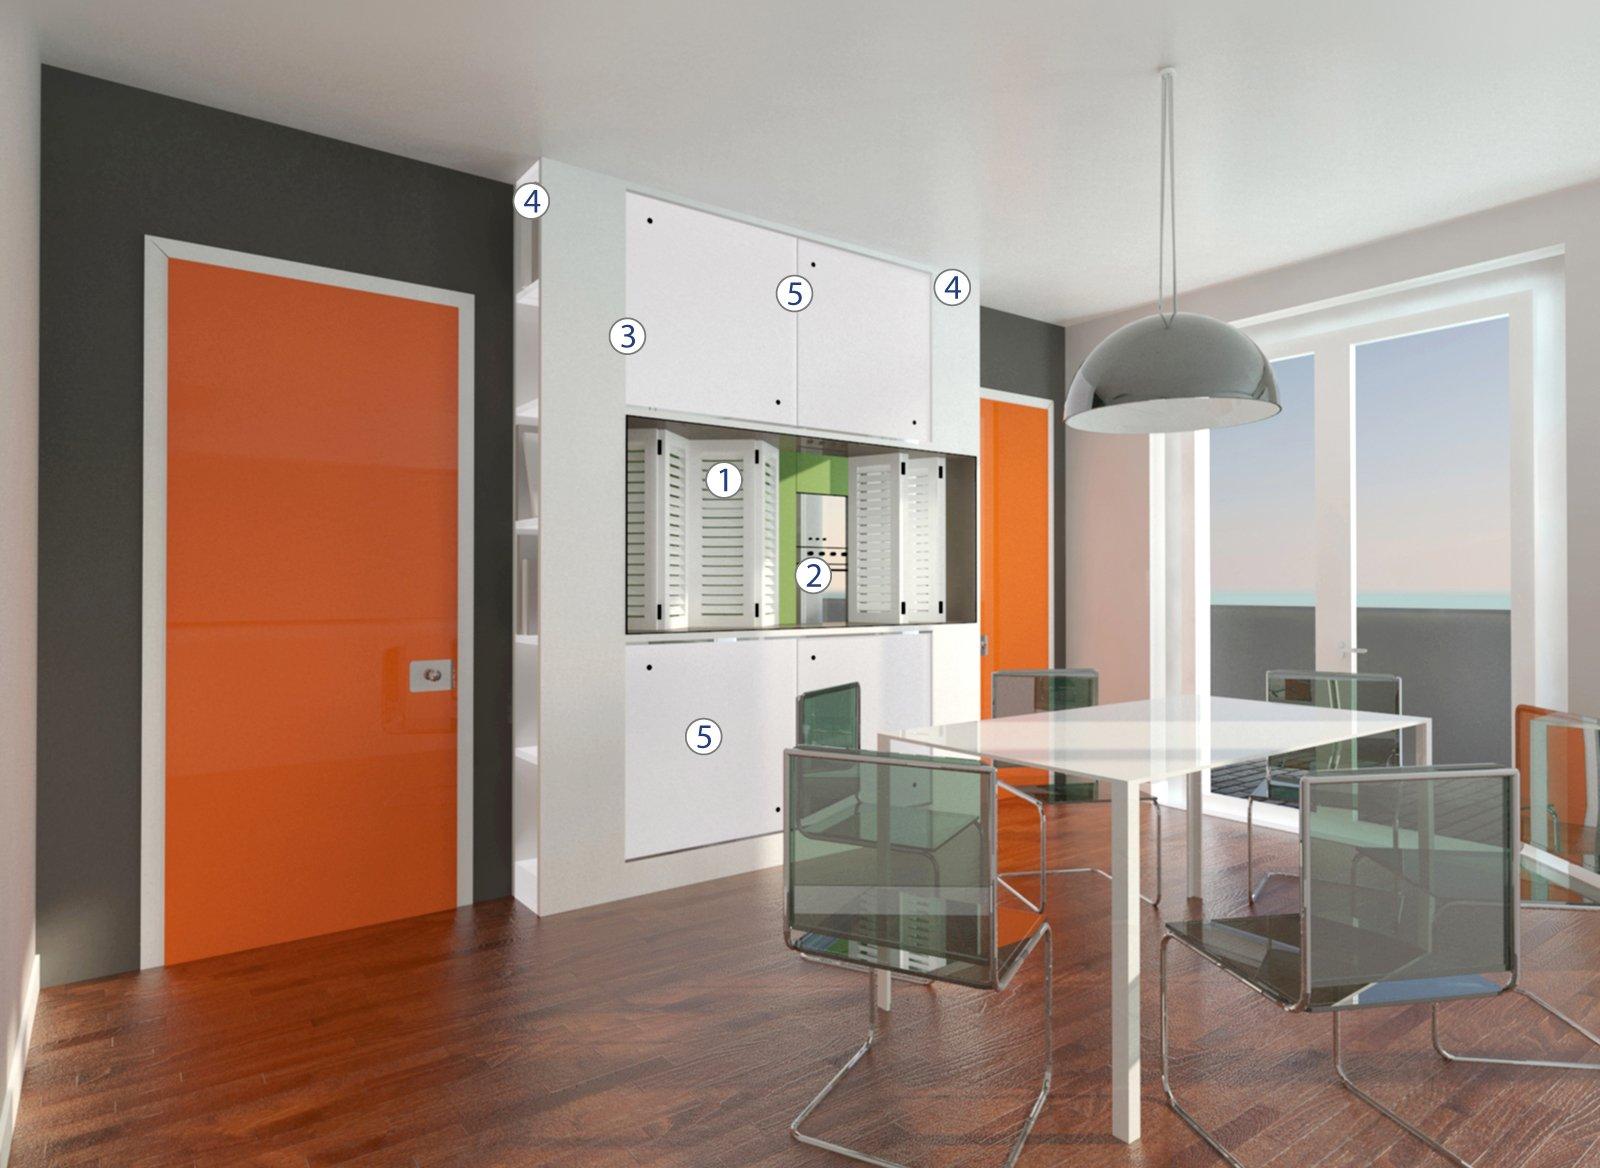 Passavivande per mettere in comunicazione cucina e zona - Sala e cucina ...